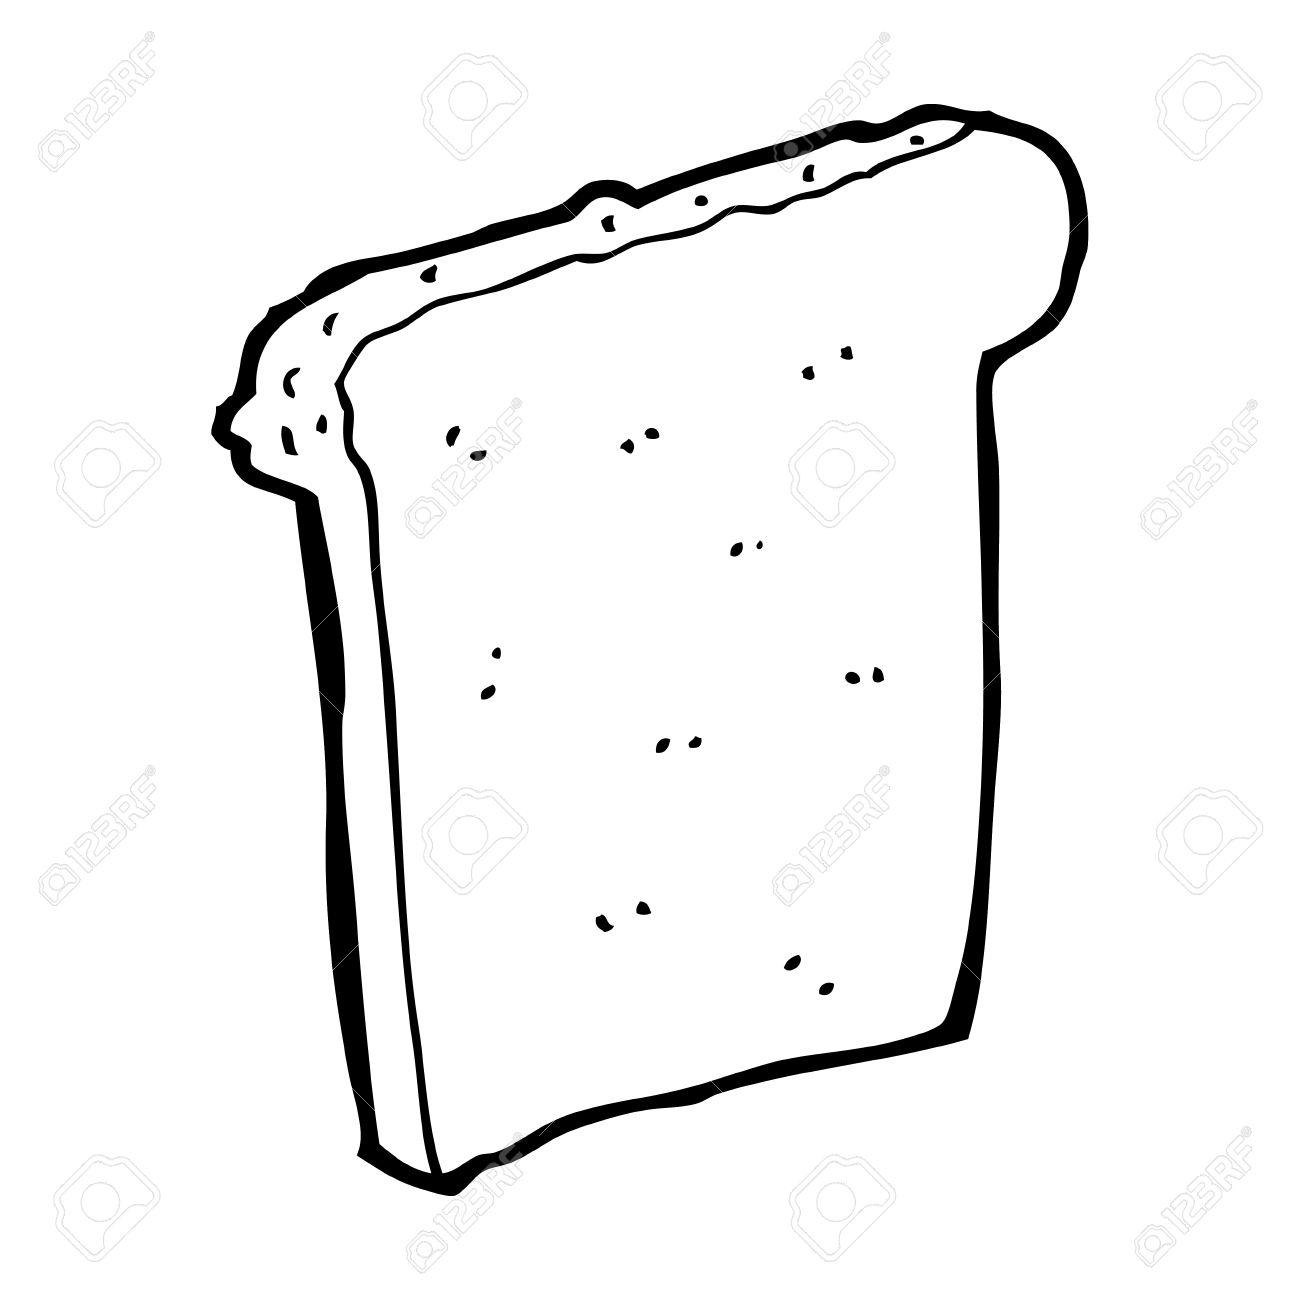 1300x1300 Cartoon Slice Of Bread Royalty Free Cliparts, Vectors, And Stock